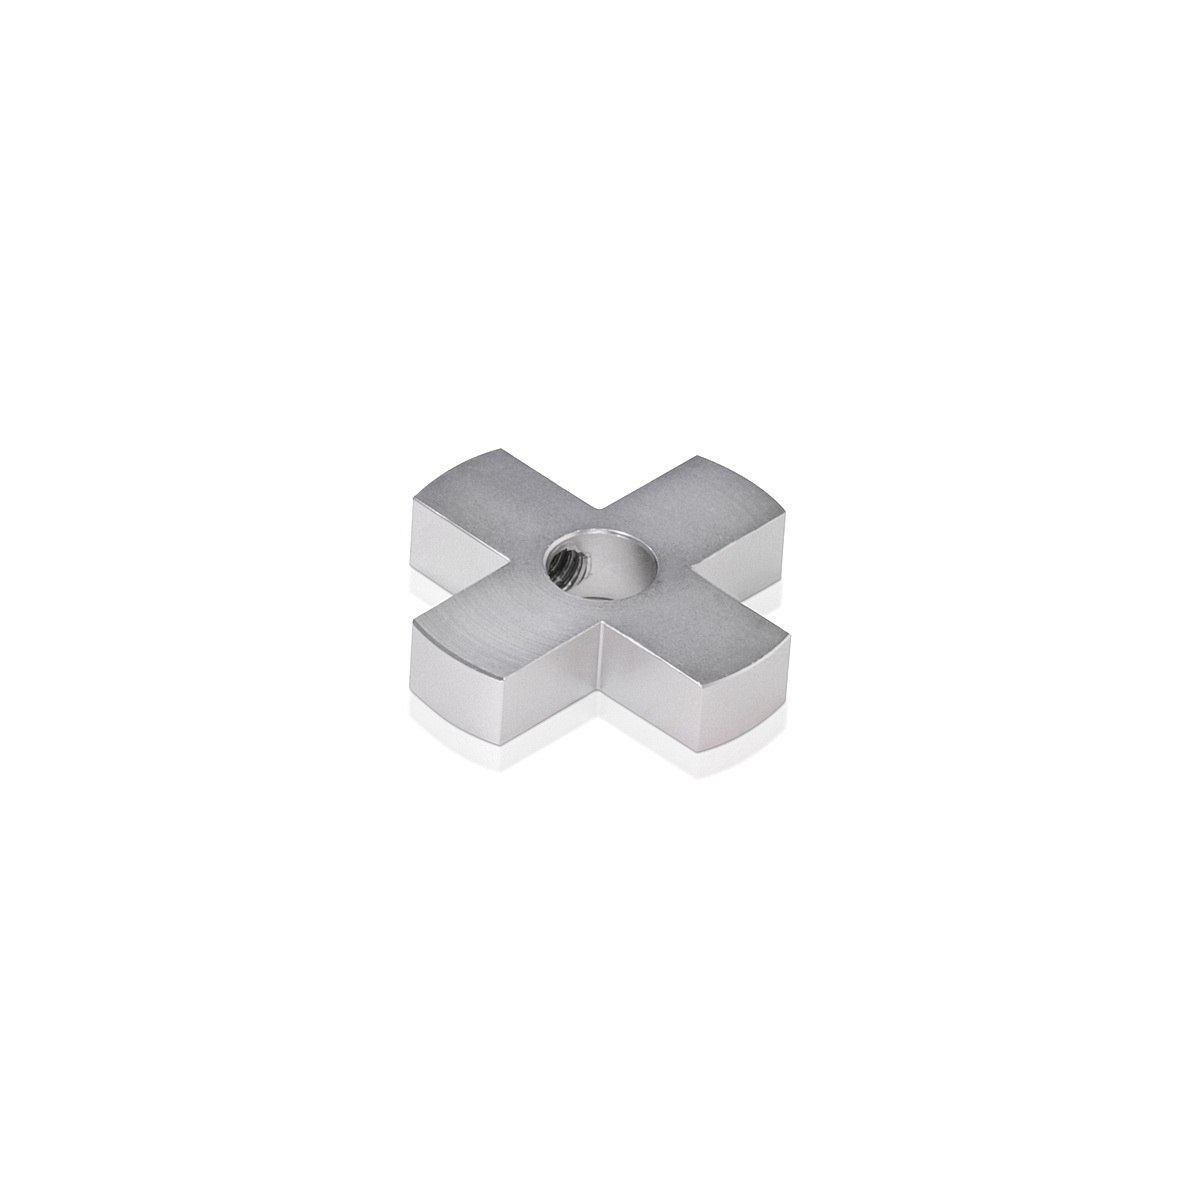 4-Way Standoffs Hub, Diameter: 1 1/4'', Thickness: 1/4'', Clear Anodized Aluminum